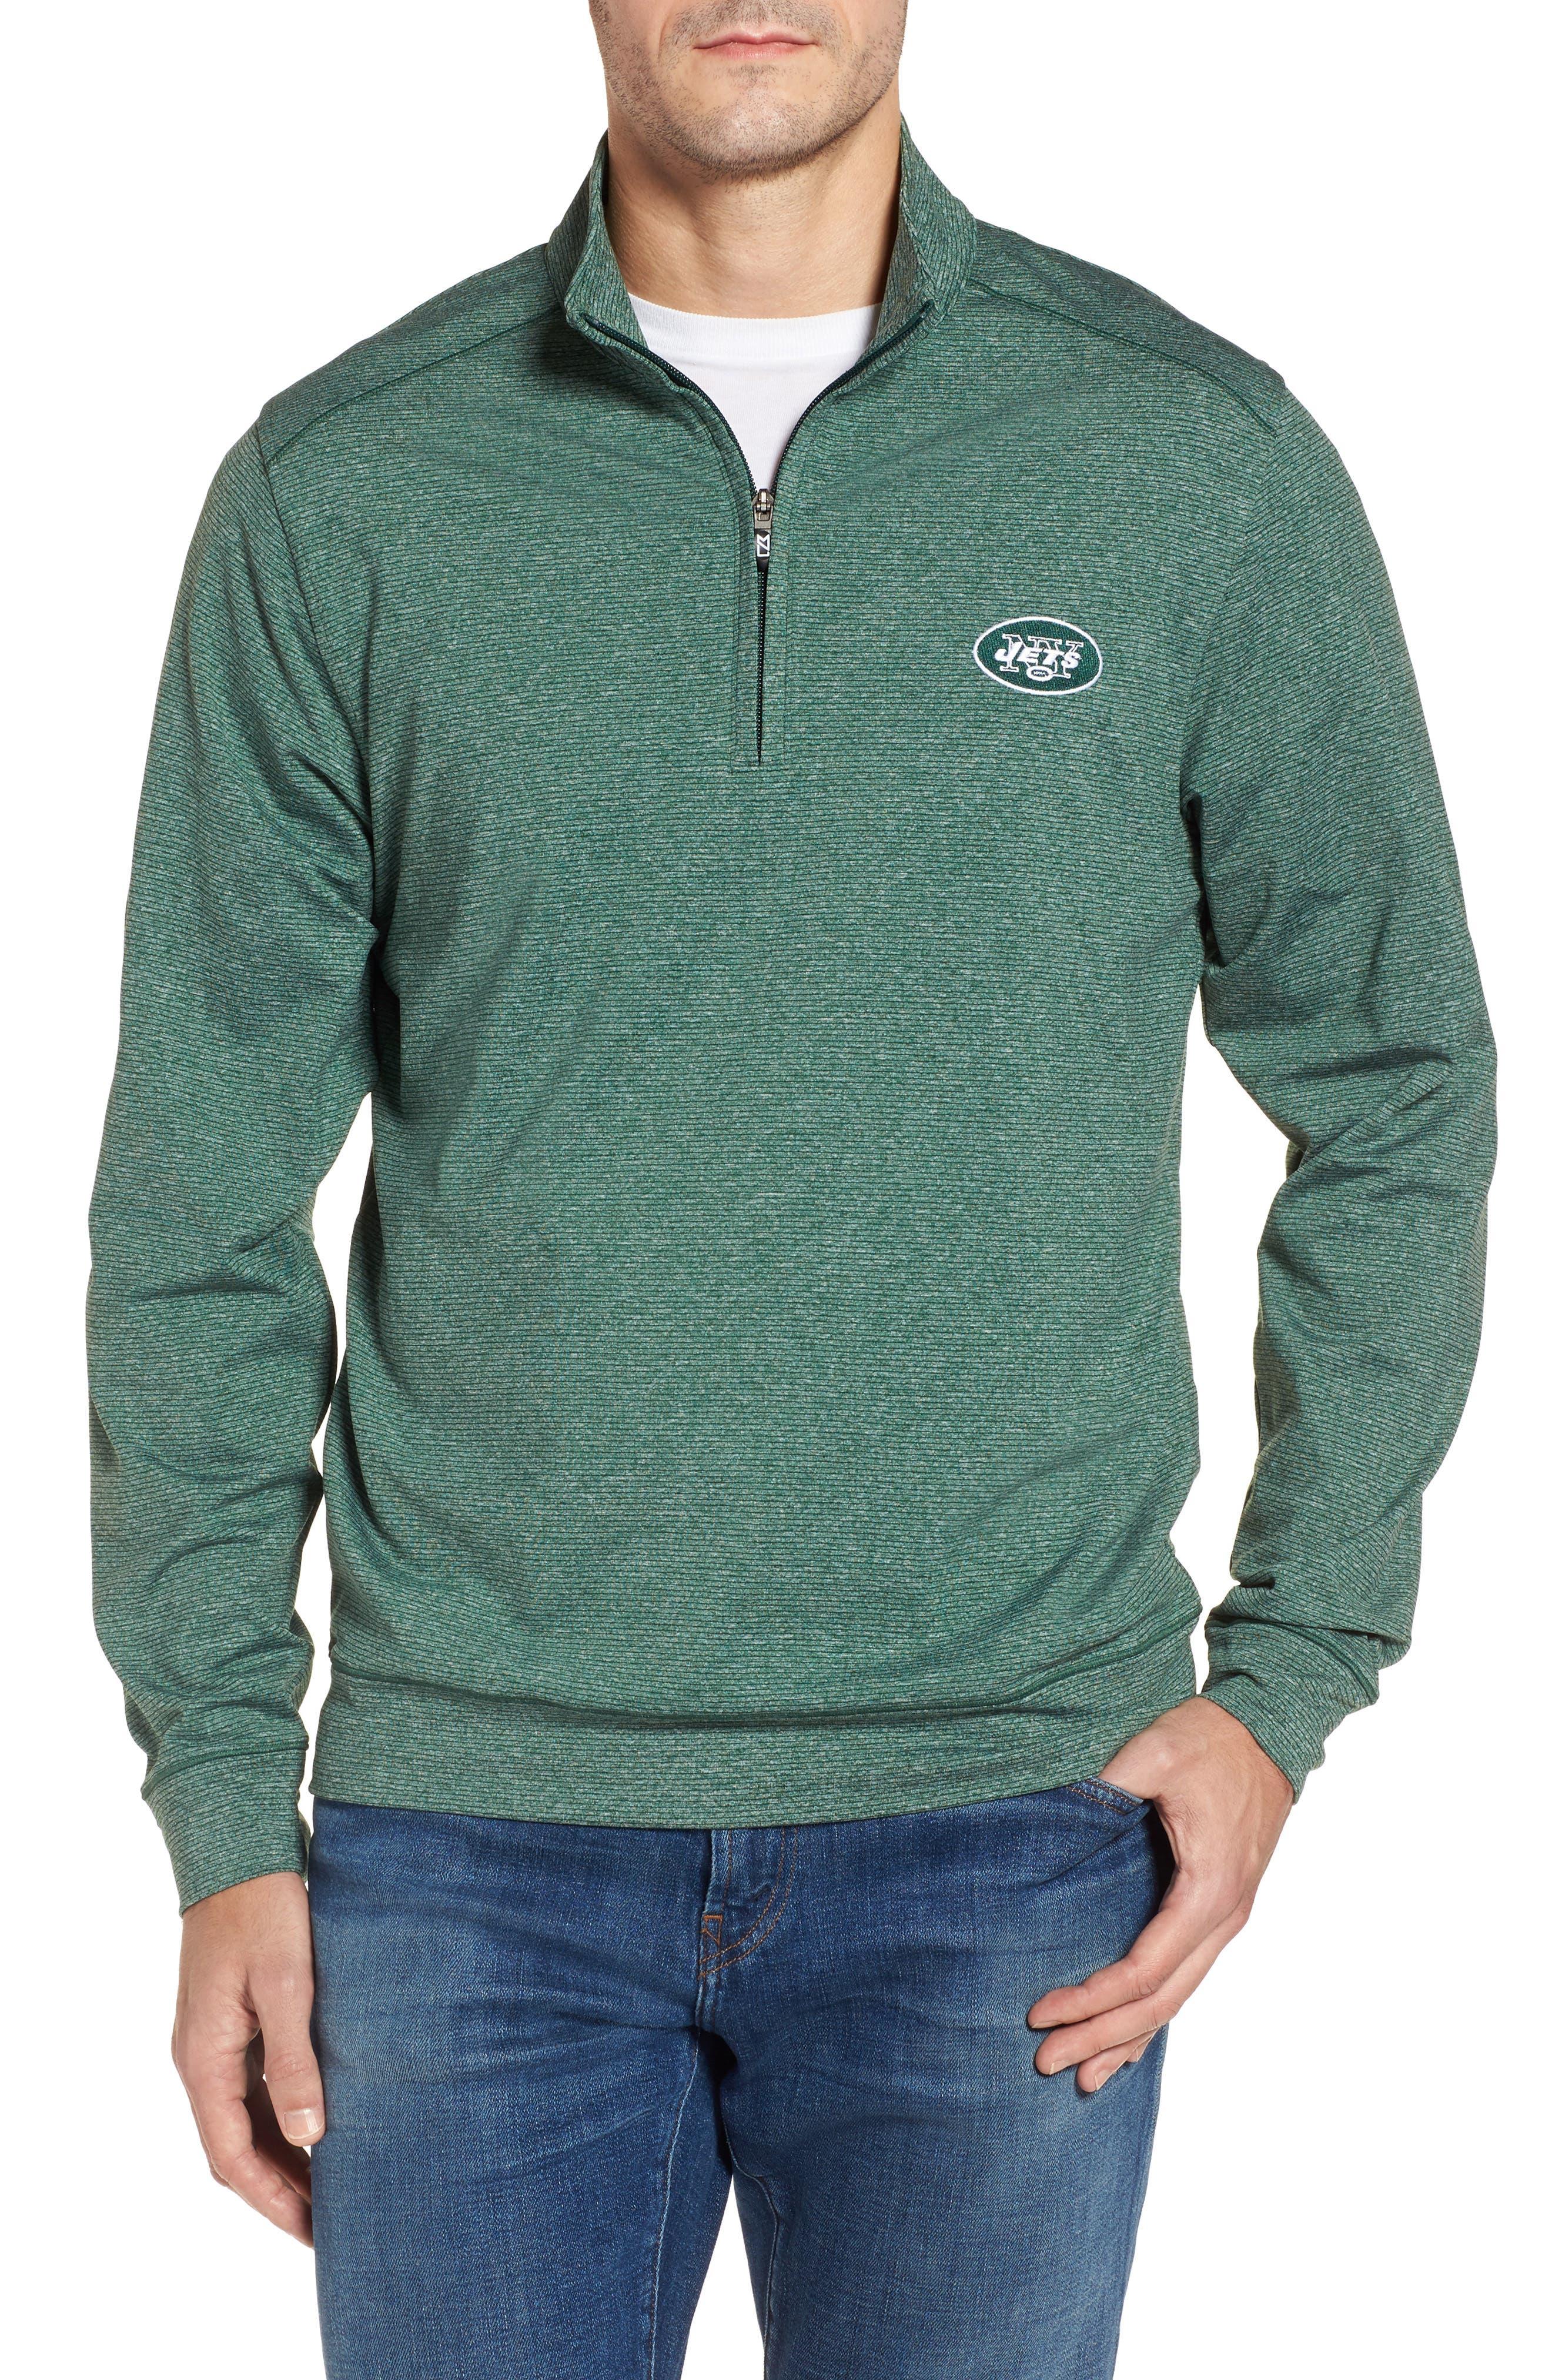 Cutter & Buck Shoreline - New York Jets Half Zip Pullover